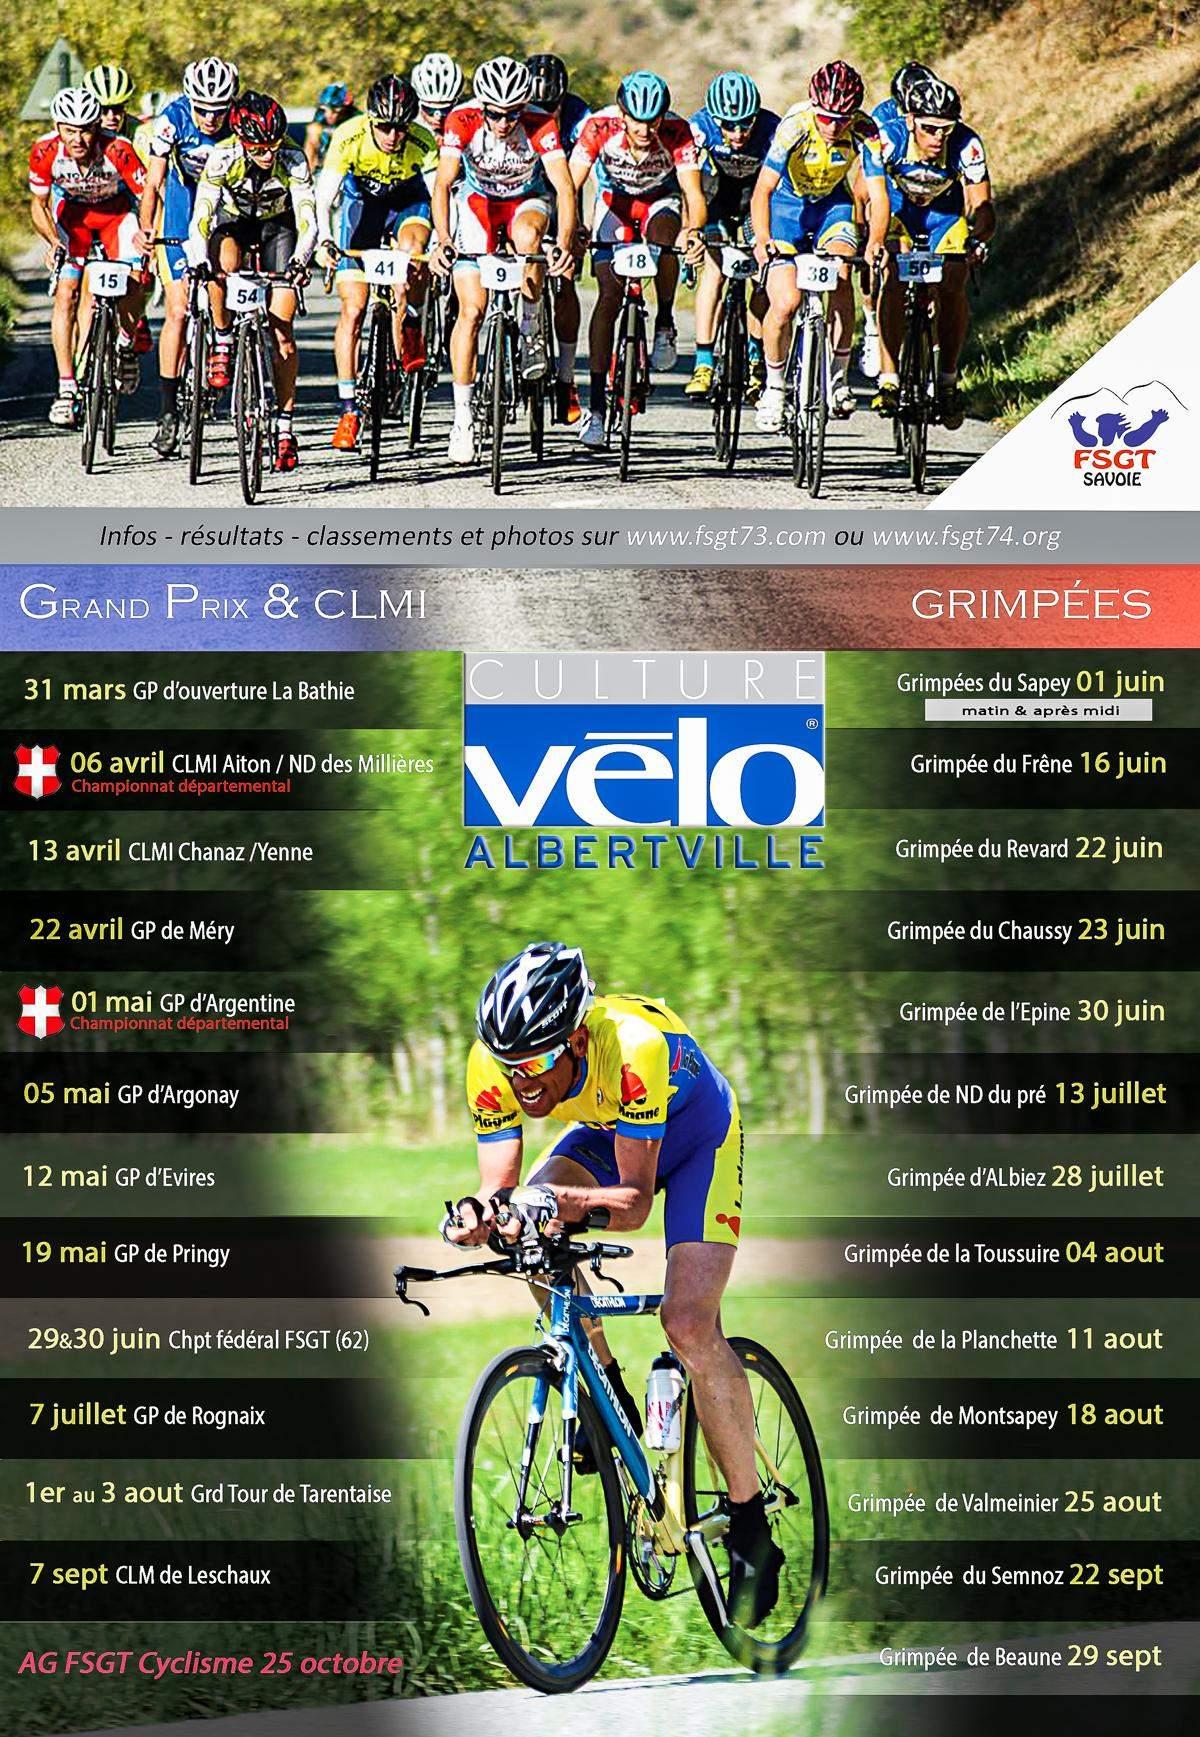 Calendrier Fsgt Cyclisme 2019.Actualite Calendrier Fsgt 73 2019 Club Cyclisme